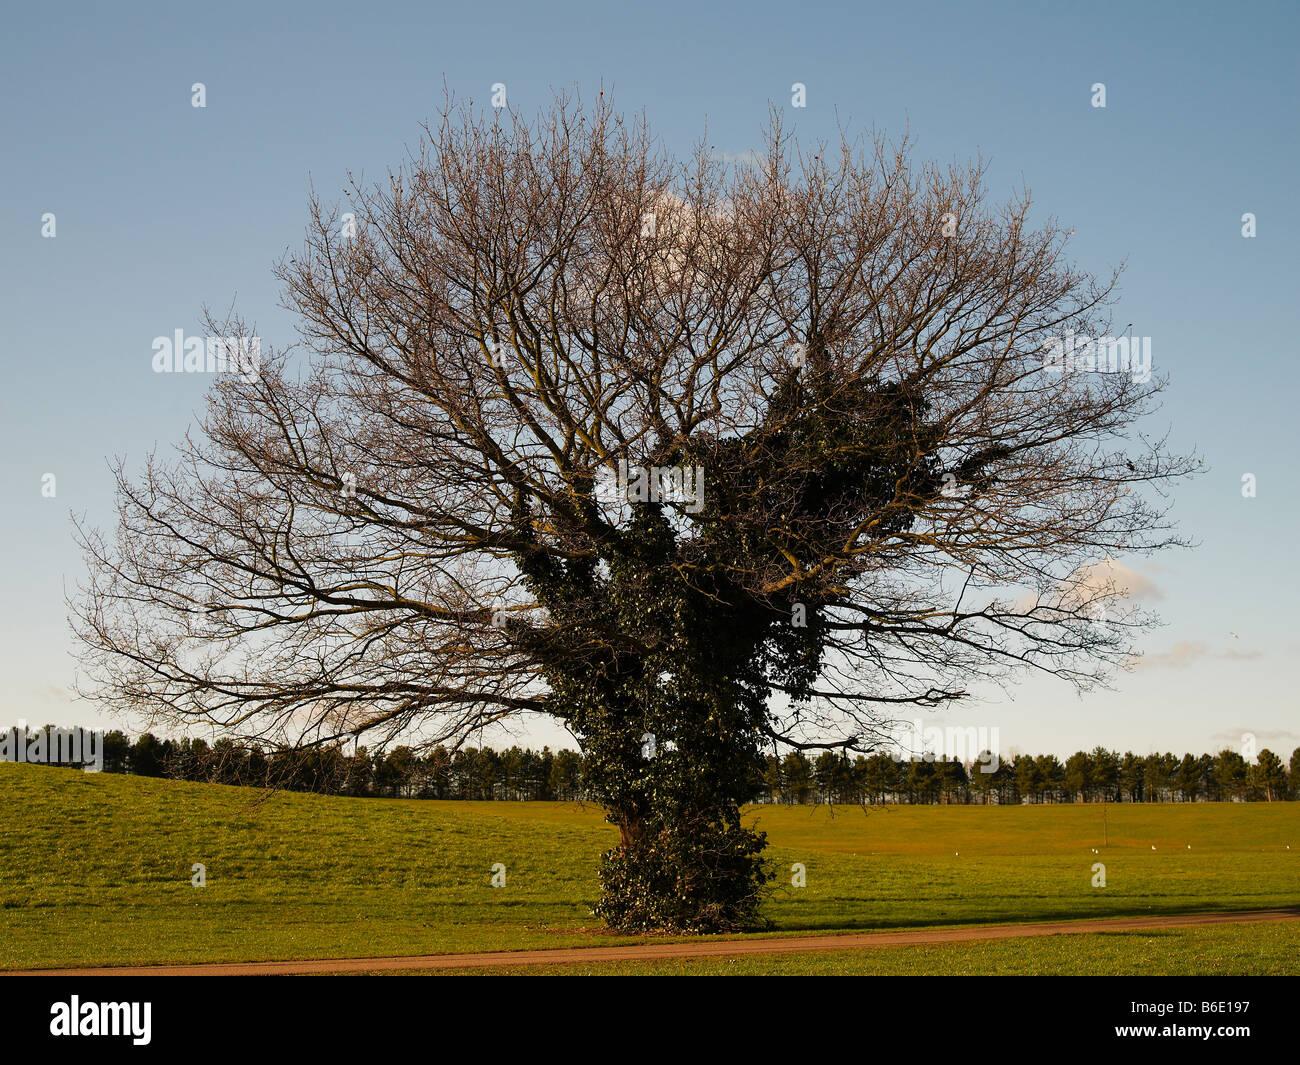 Bare tree, Willen Lake, Milton Keynes, Midland, UK - Stock Image